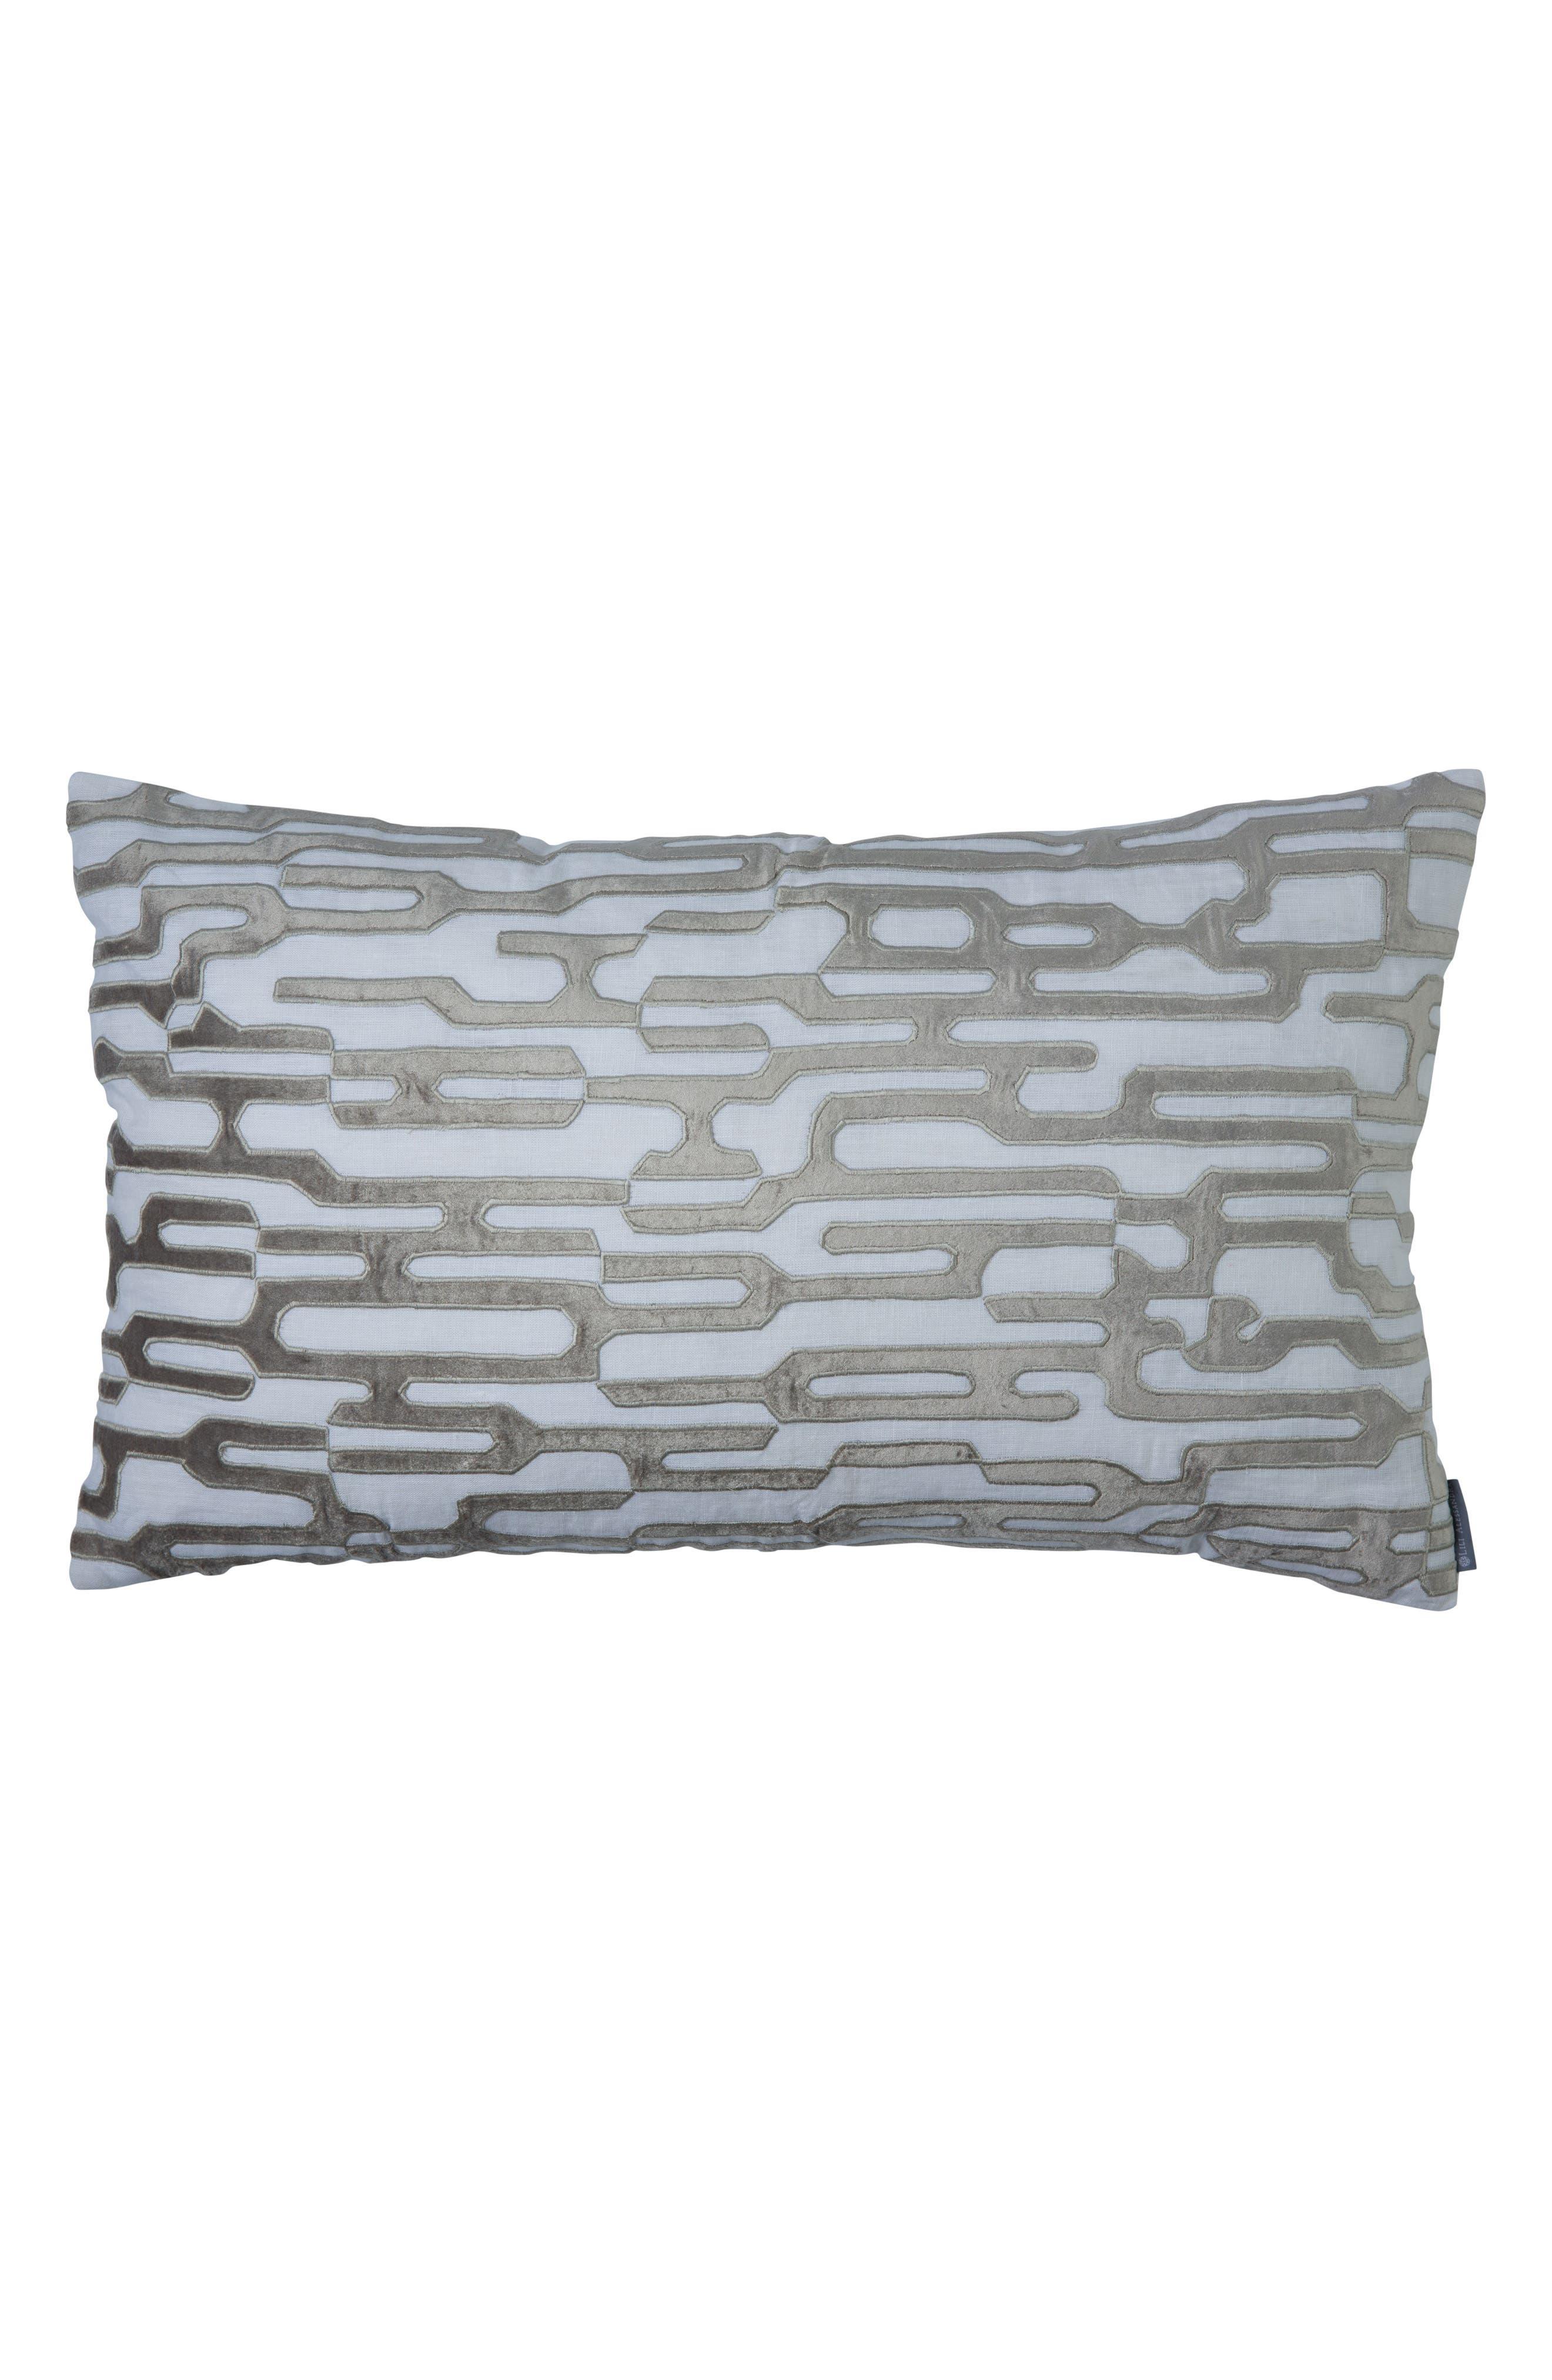 Christian Large Linen Velvet Accent Pillow,                         Main,                         color, Gray